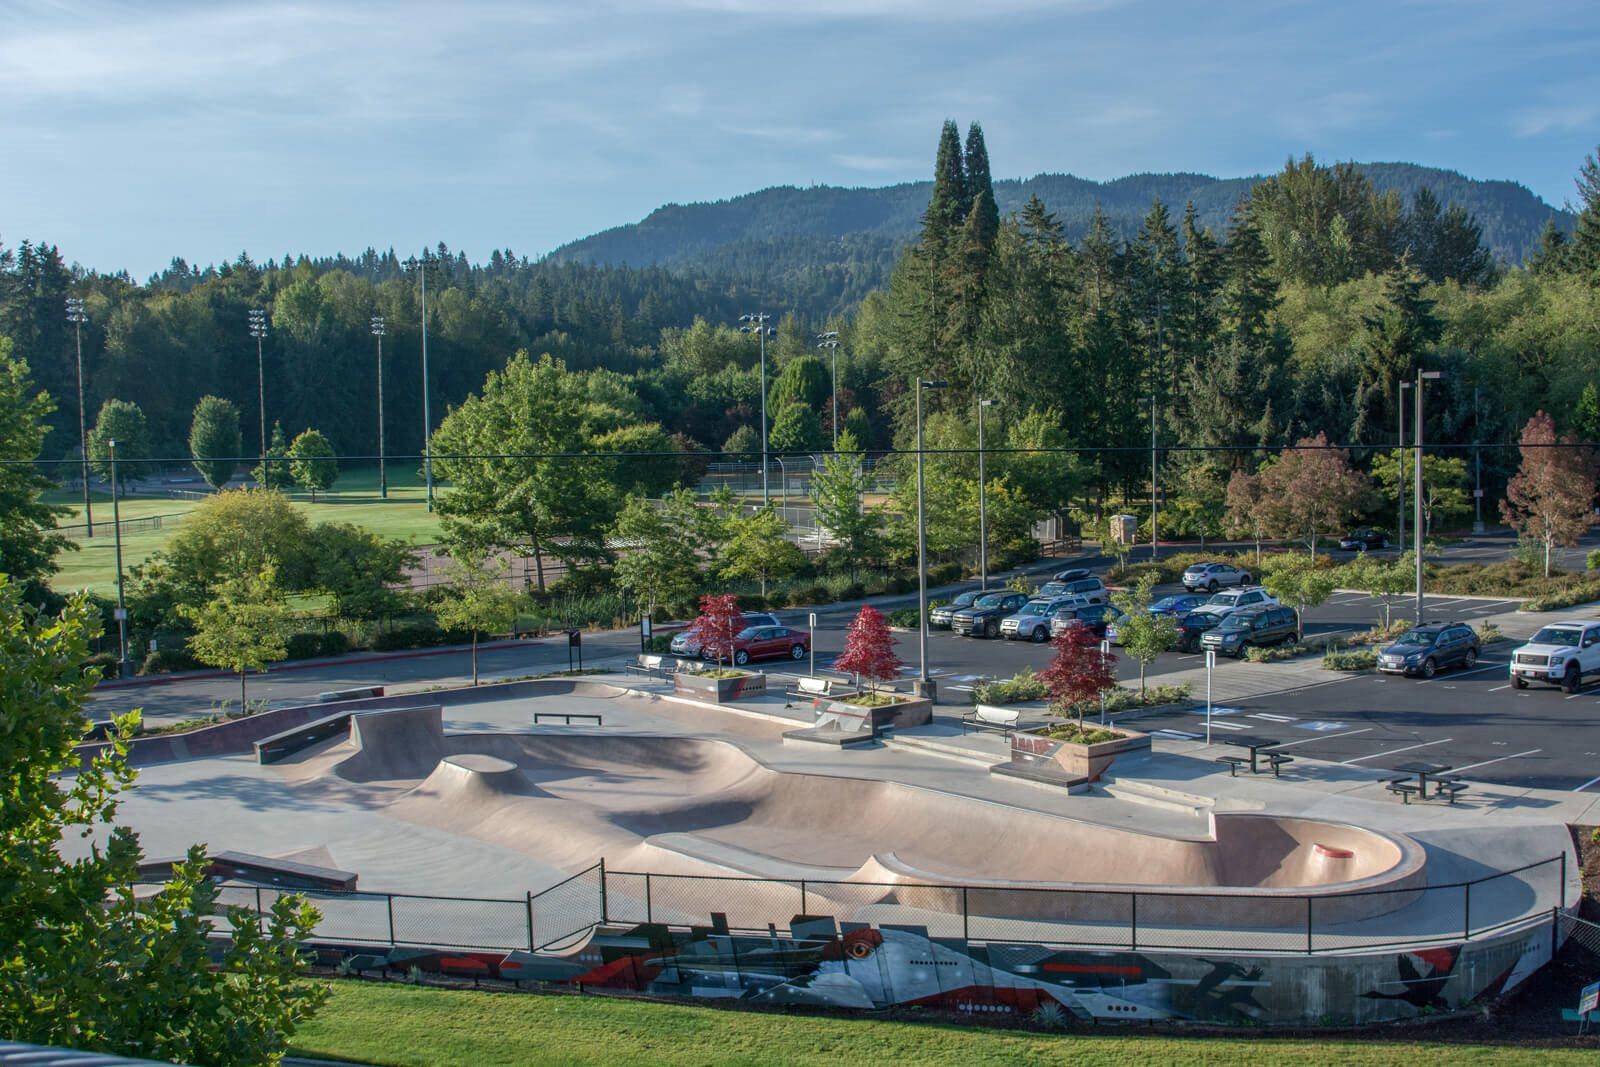 Skate Park Close By at The Estates at Cougar Mountain, 2128 Shy Bear Way NW, Issaquah